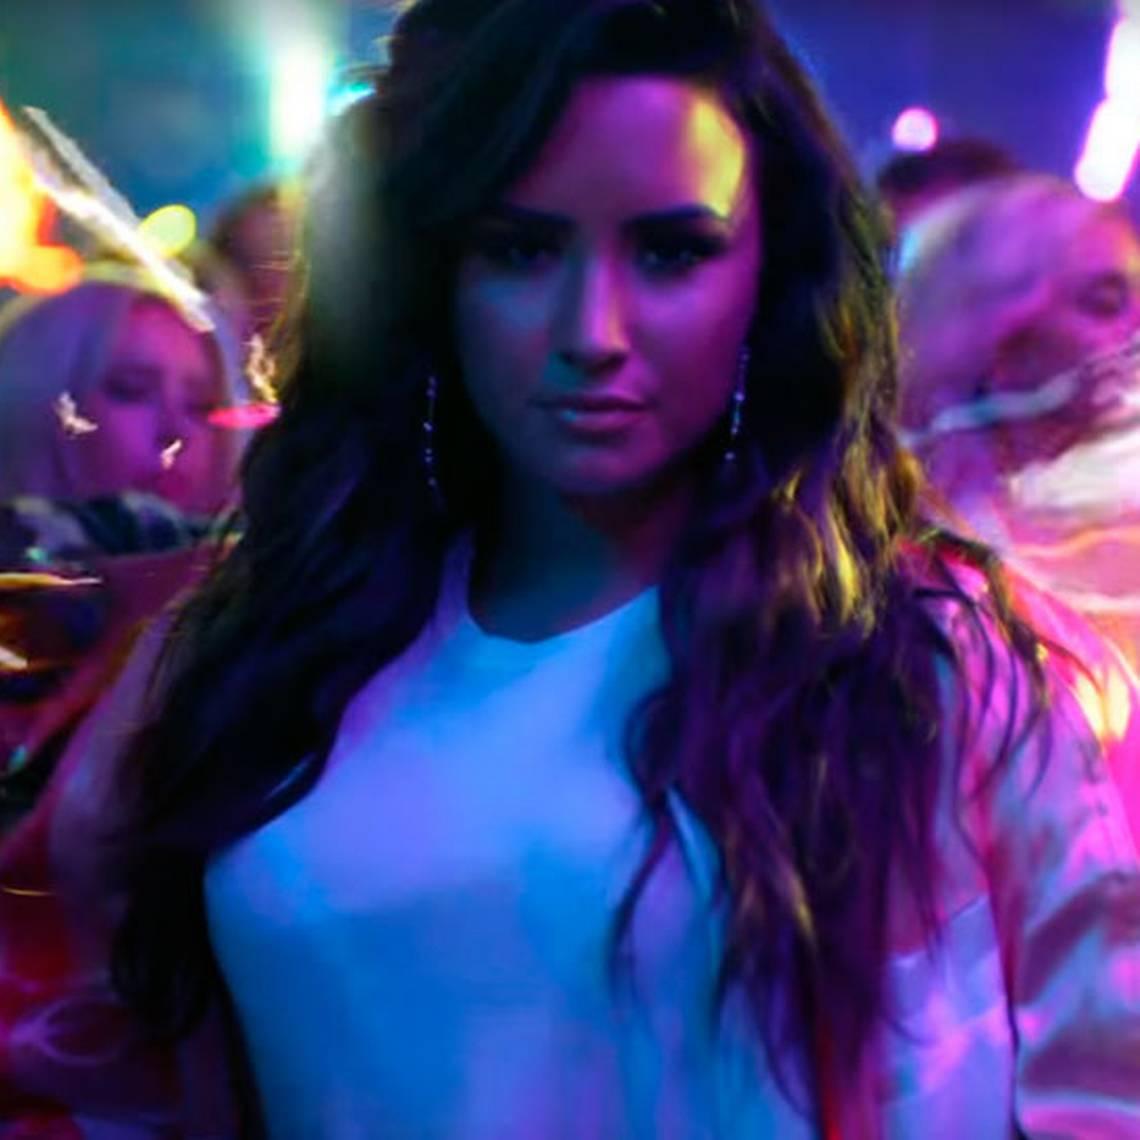 "Demi Lovato te invita su fiesta en el videoclip de \""Sorry Not Sorry\"""